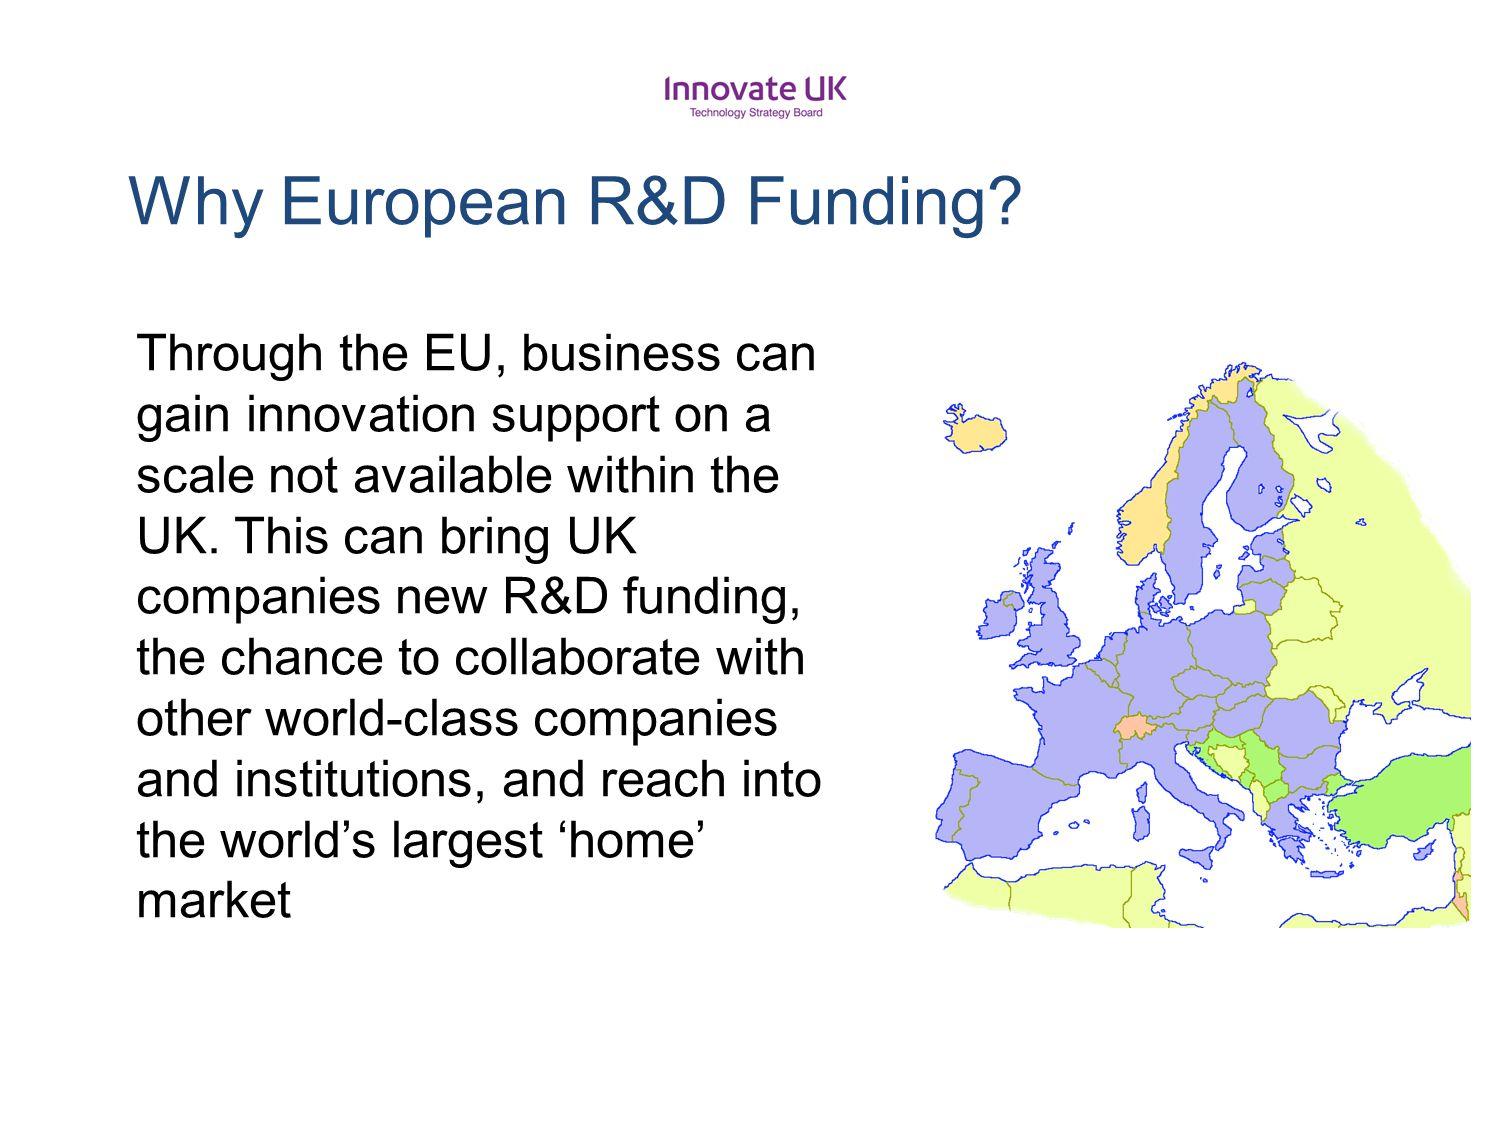 Why European R&D Funding